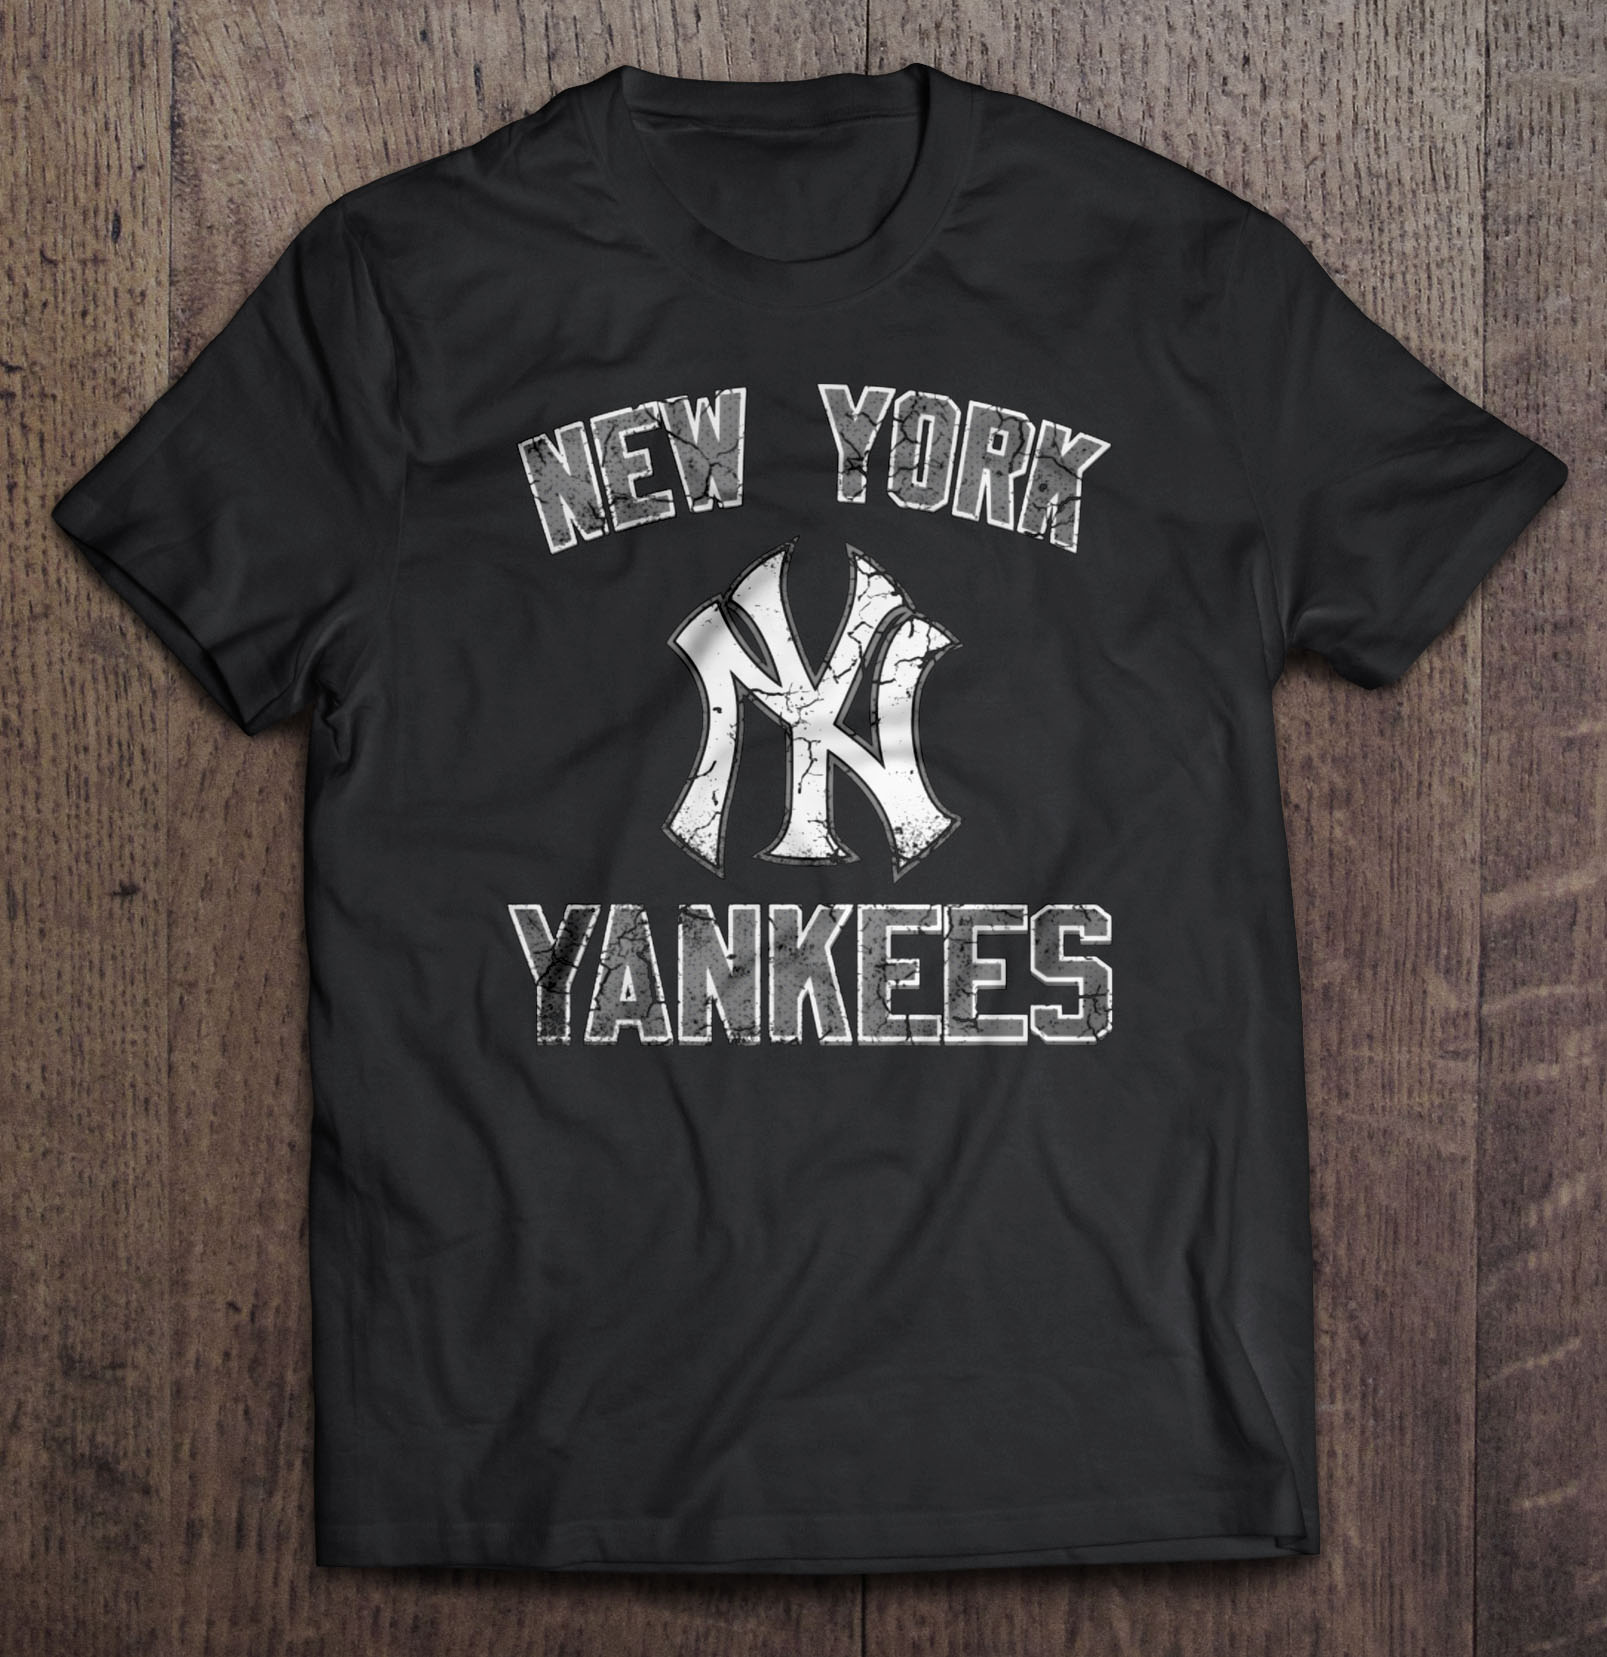 New Streetwear Harajuku York 100%Cotton Men'S Tshirt Yankees Tshirts